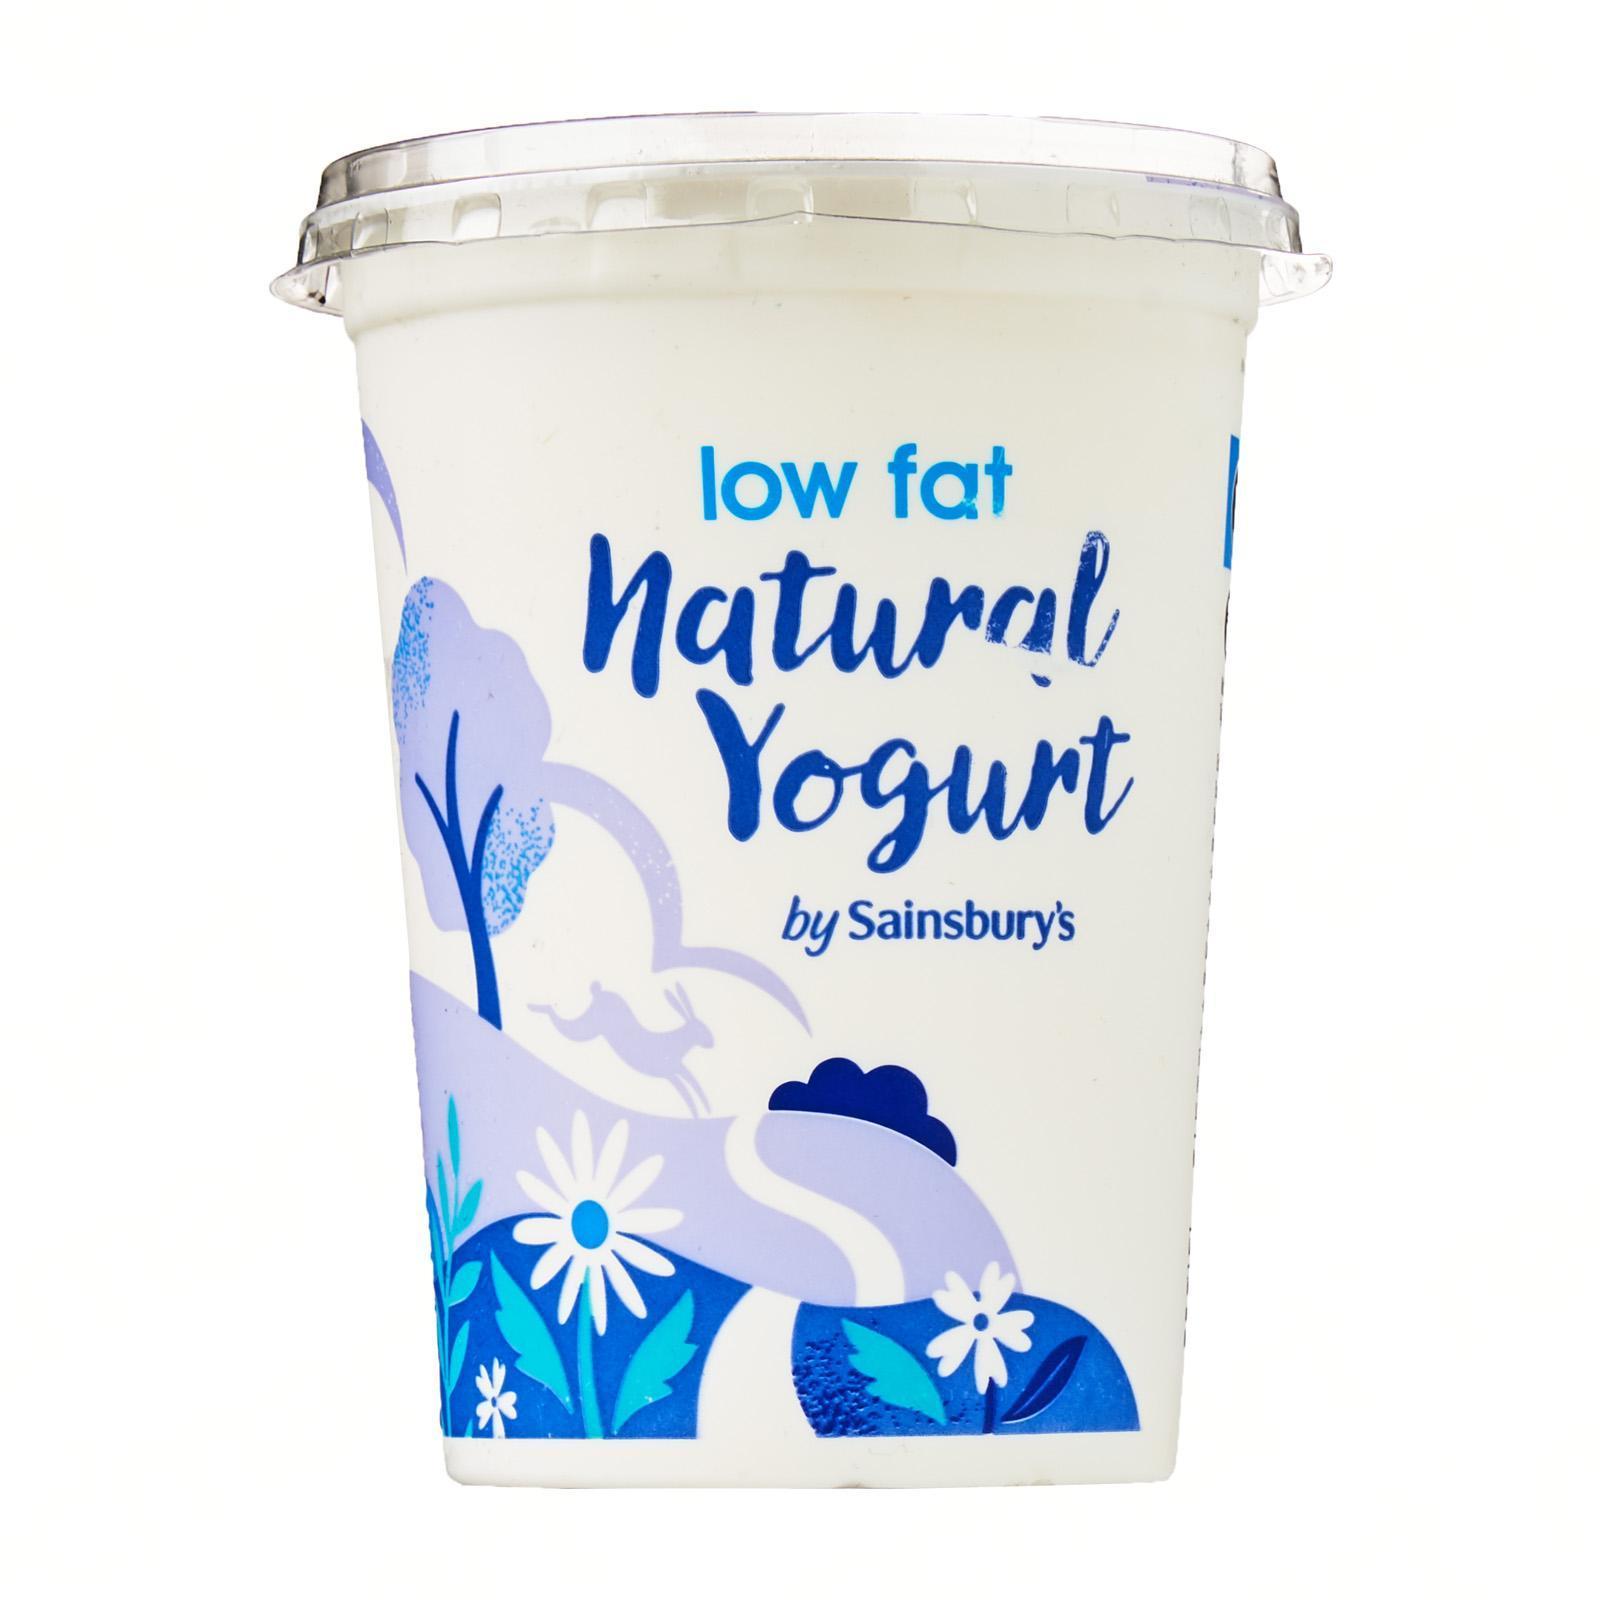 Sainsbury's Low Fat Natural Yoghurt